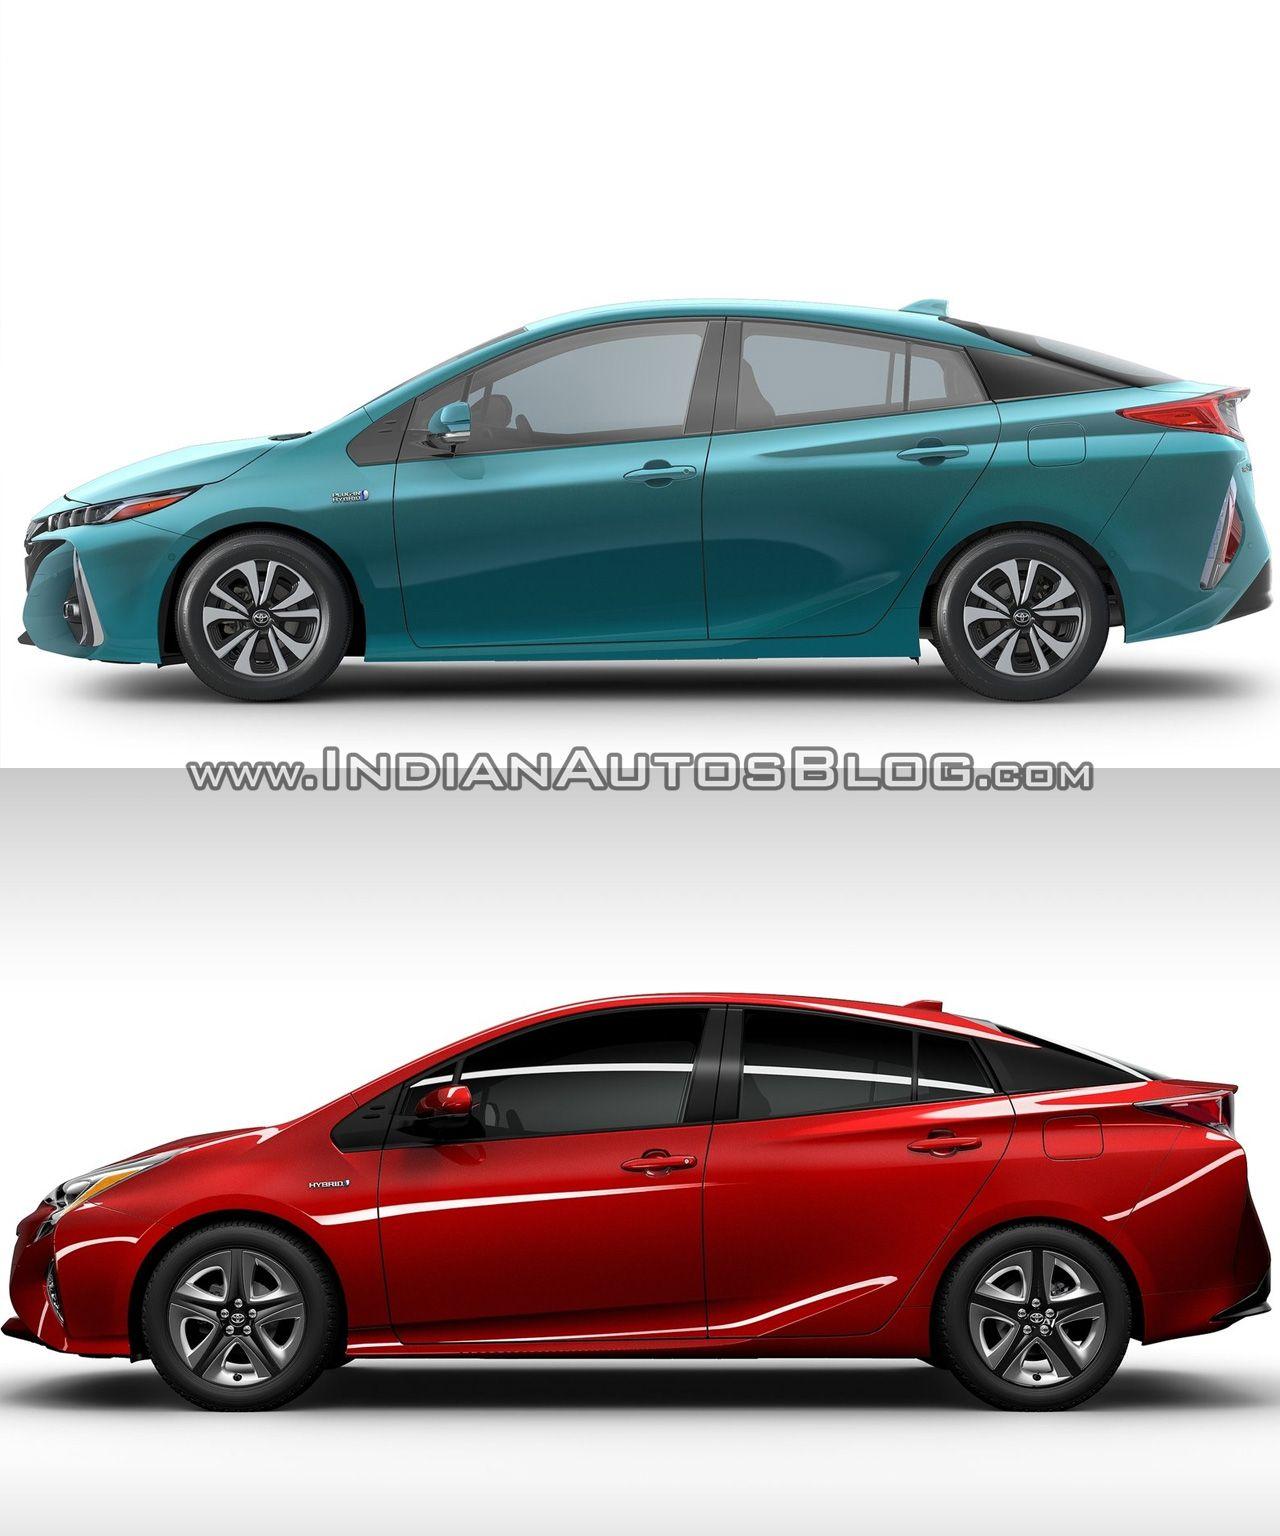 Toyota Prius Prime Vs. 2016 Toyota Prius